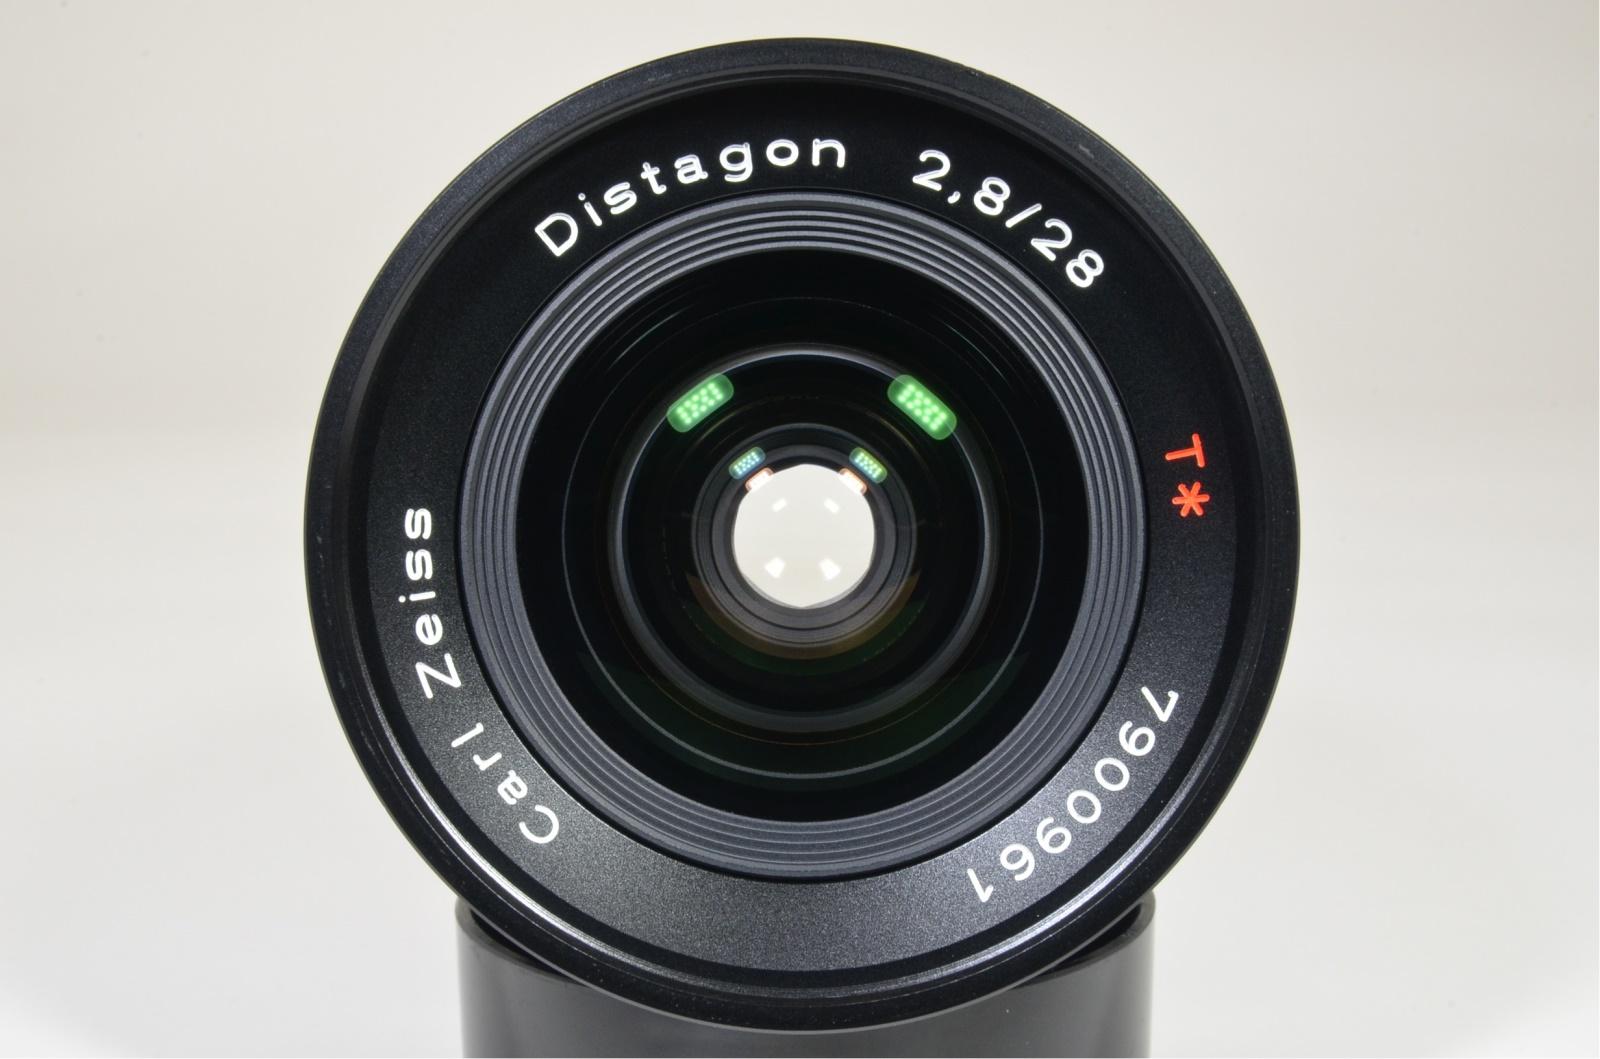 contax carl zeiss distagon t* 28mm f2.8 mmj japan near mint shooting tested